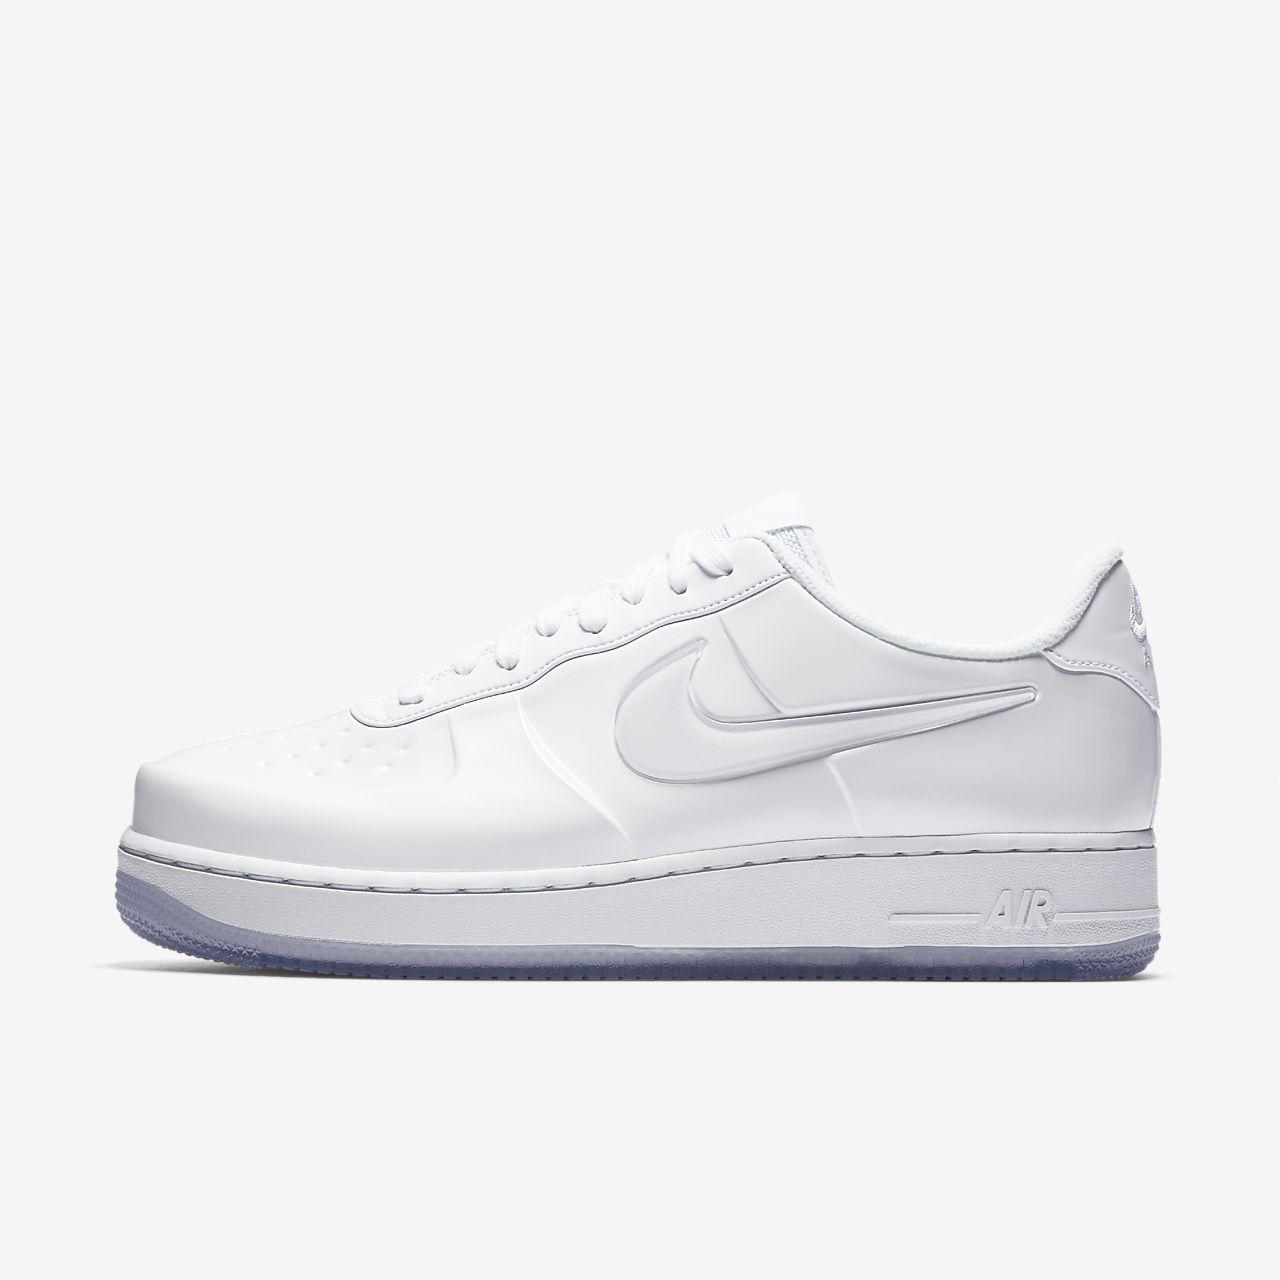 sale retailer e5f34 9f53c ... Nike Air Force 1 Foamposite Pro Cup-sko til mænd